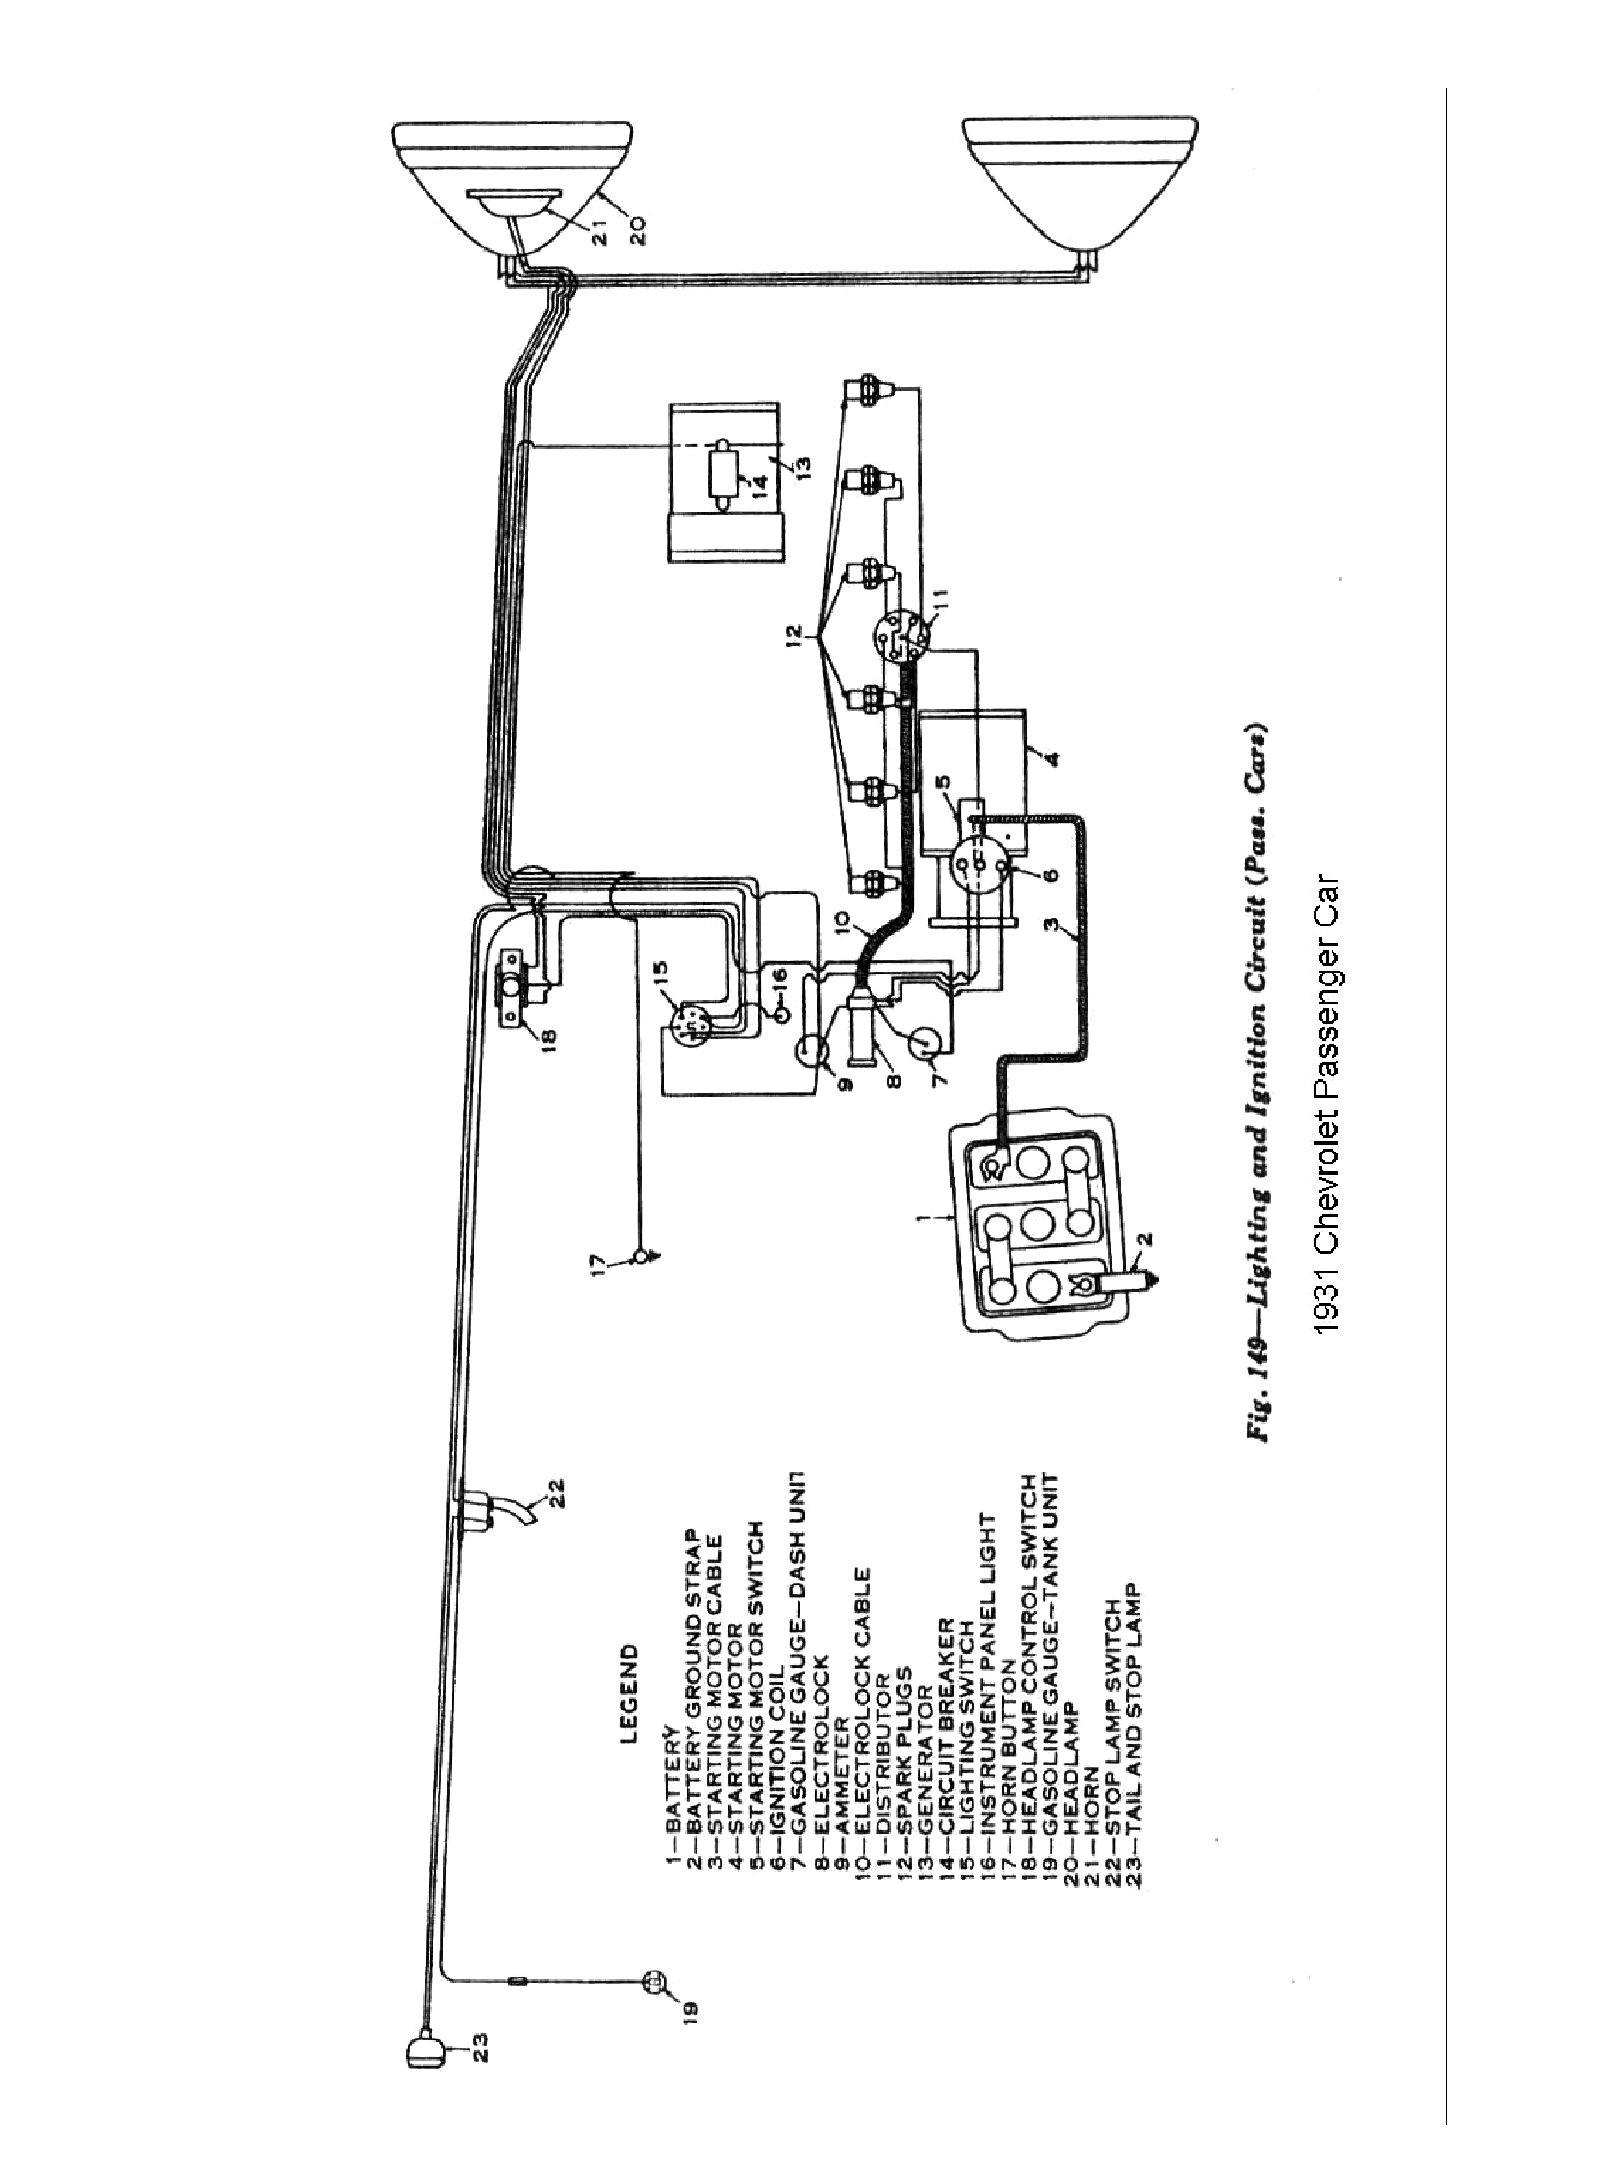 jeep fuel gauge wiring diagram wiring diagram 1998 jeep cherokee fuel pump wiring diagram jeep fuel gauge wiring for 1972